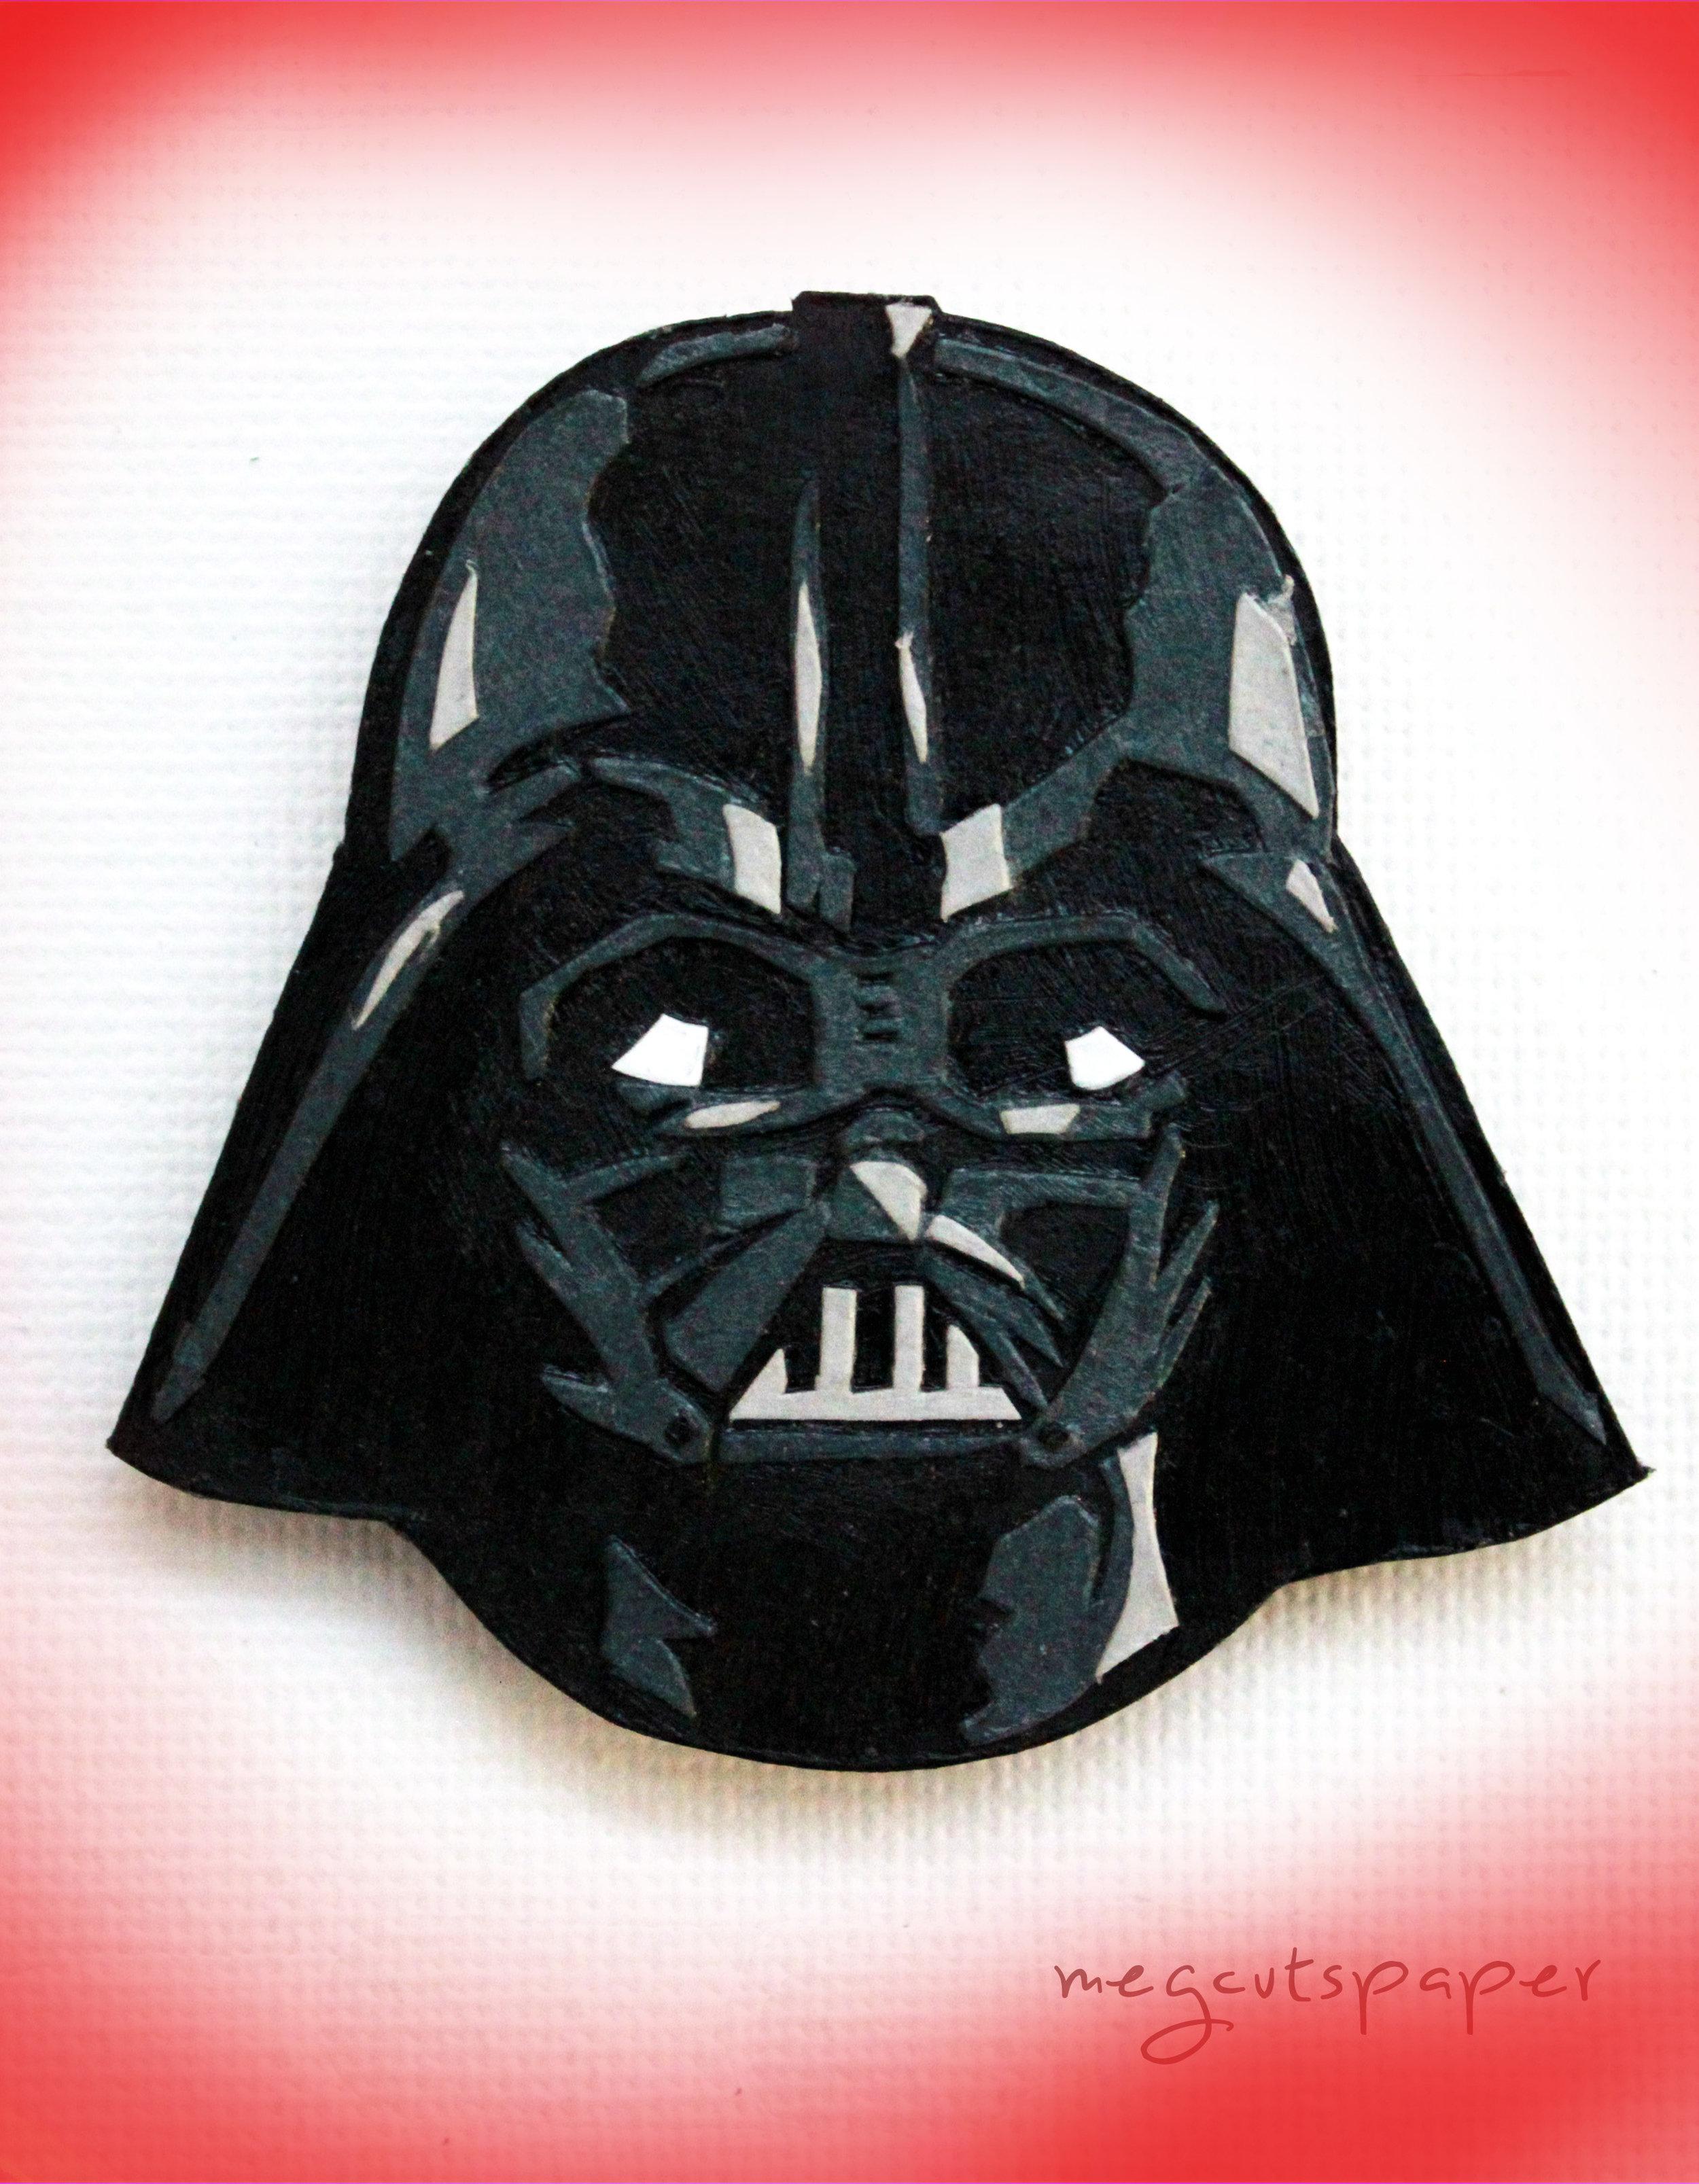 Megcutspaper_Star_Wars_Darth_Vader_Magnet.jpg